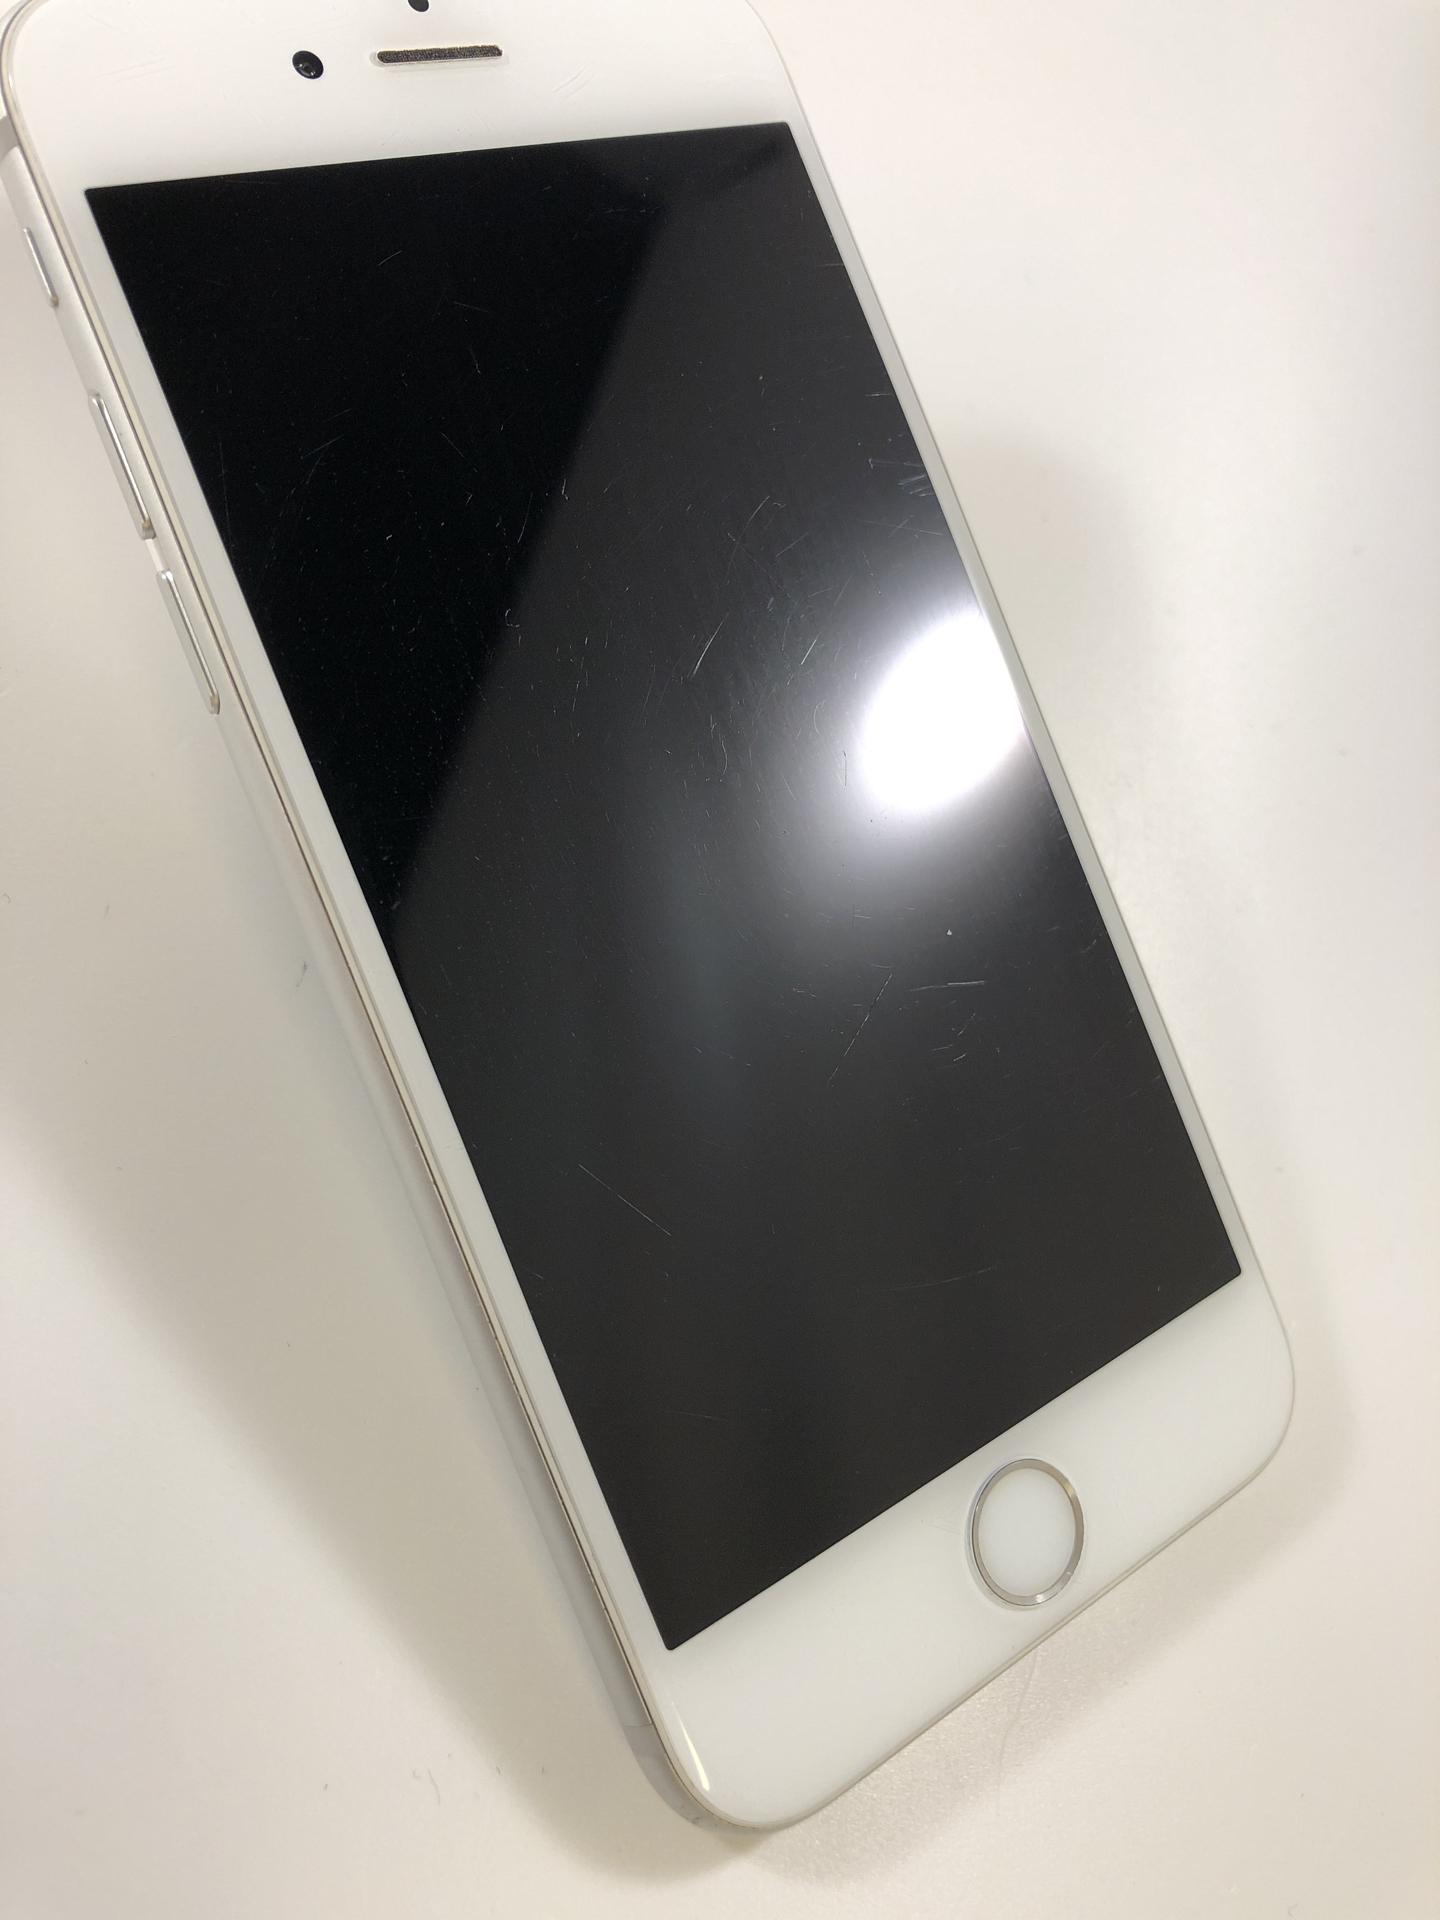 iPhone 6 16GB, 16GB, Silver, bild 3